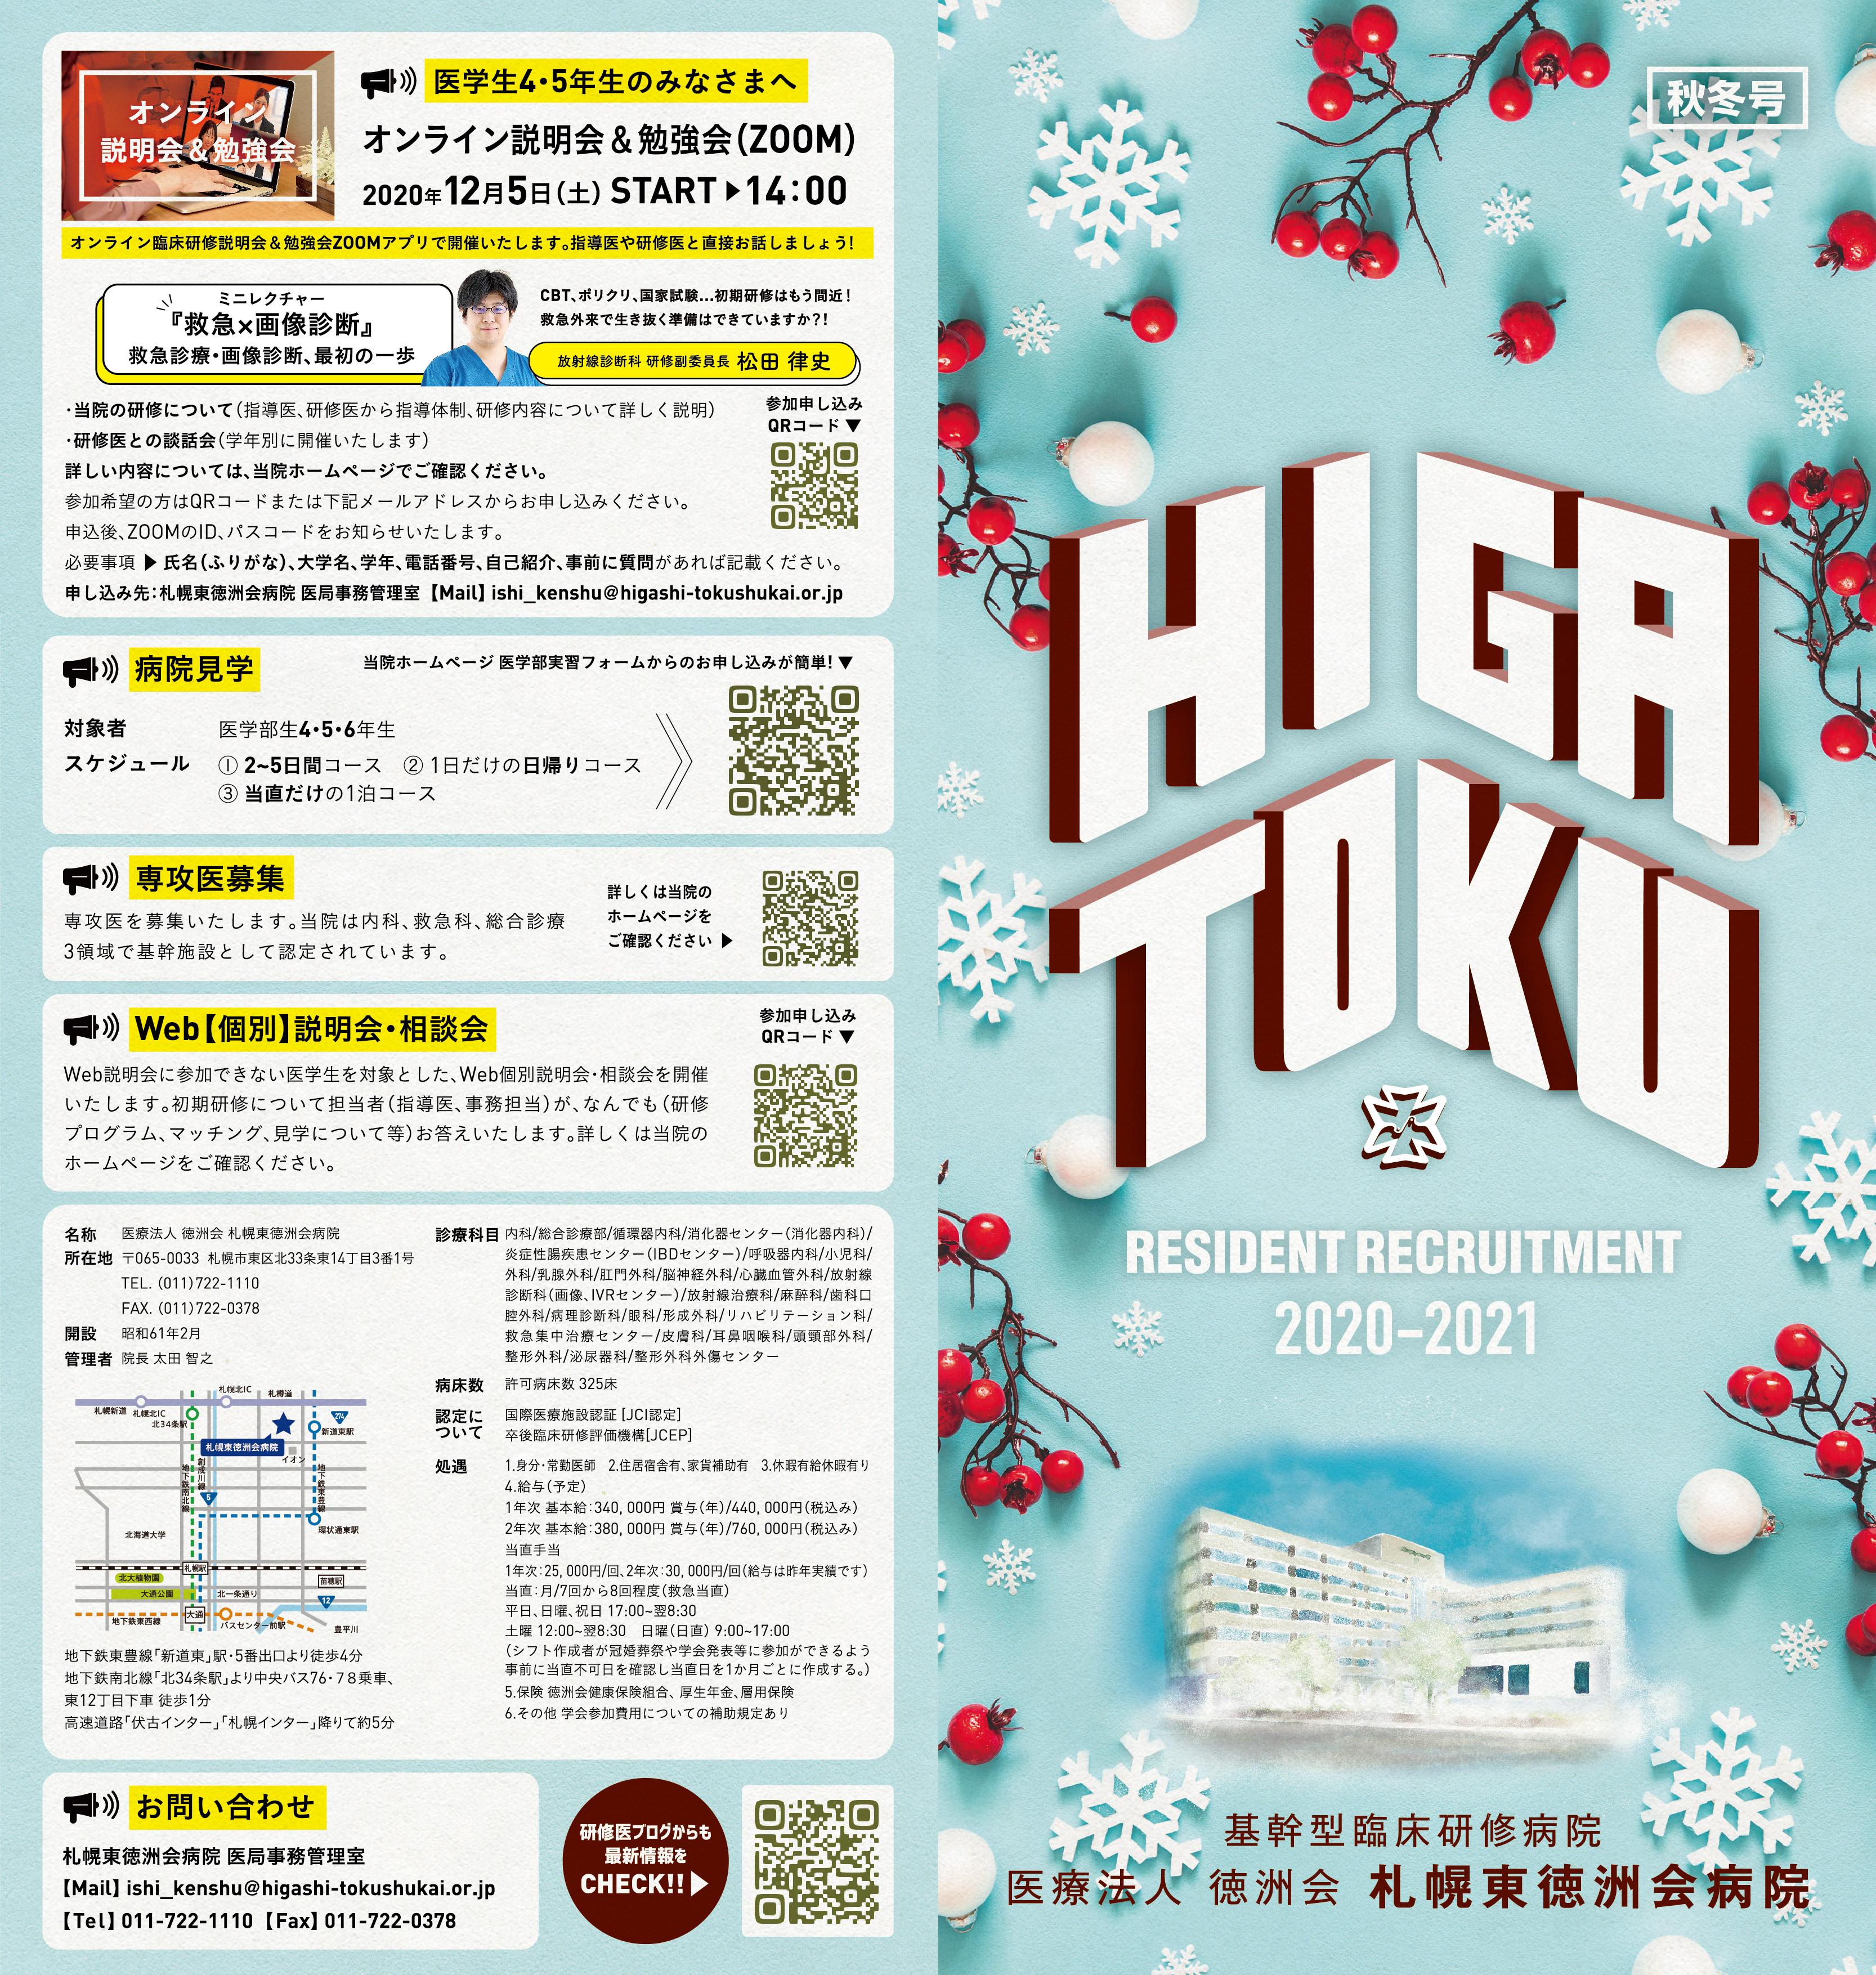 http://blog.higashi-tokushukai.or.jp/ydblog/%E7%A7%8B%E5%86%AC%E5%8F%B7_%E8%A1%A8%E7%B4%99.jpg